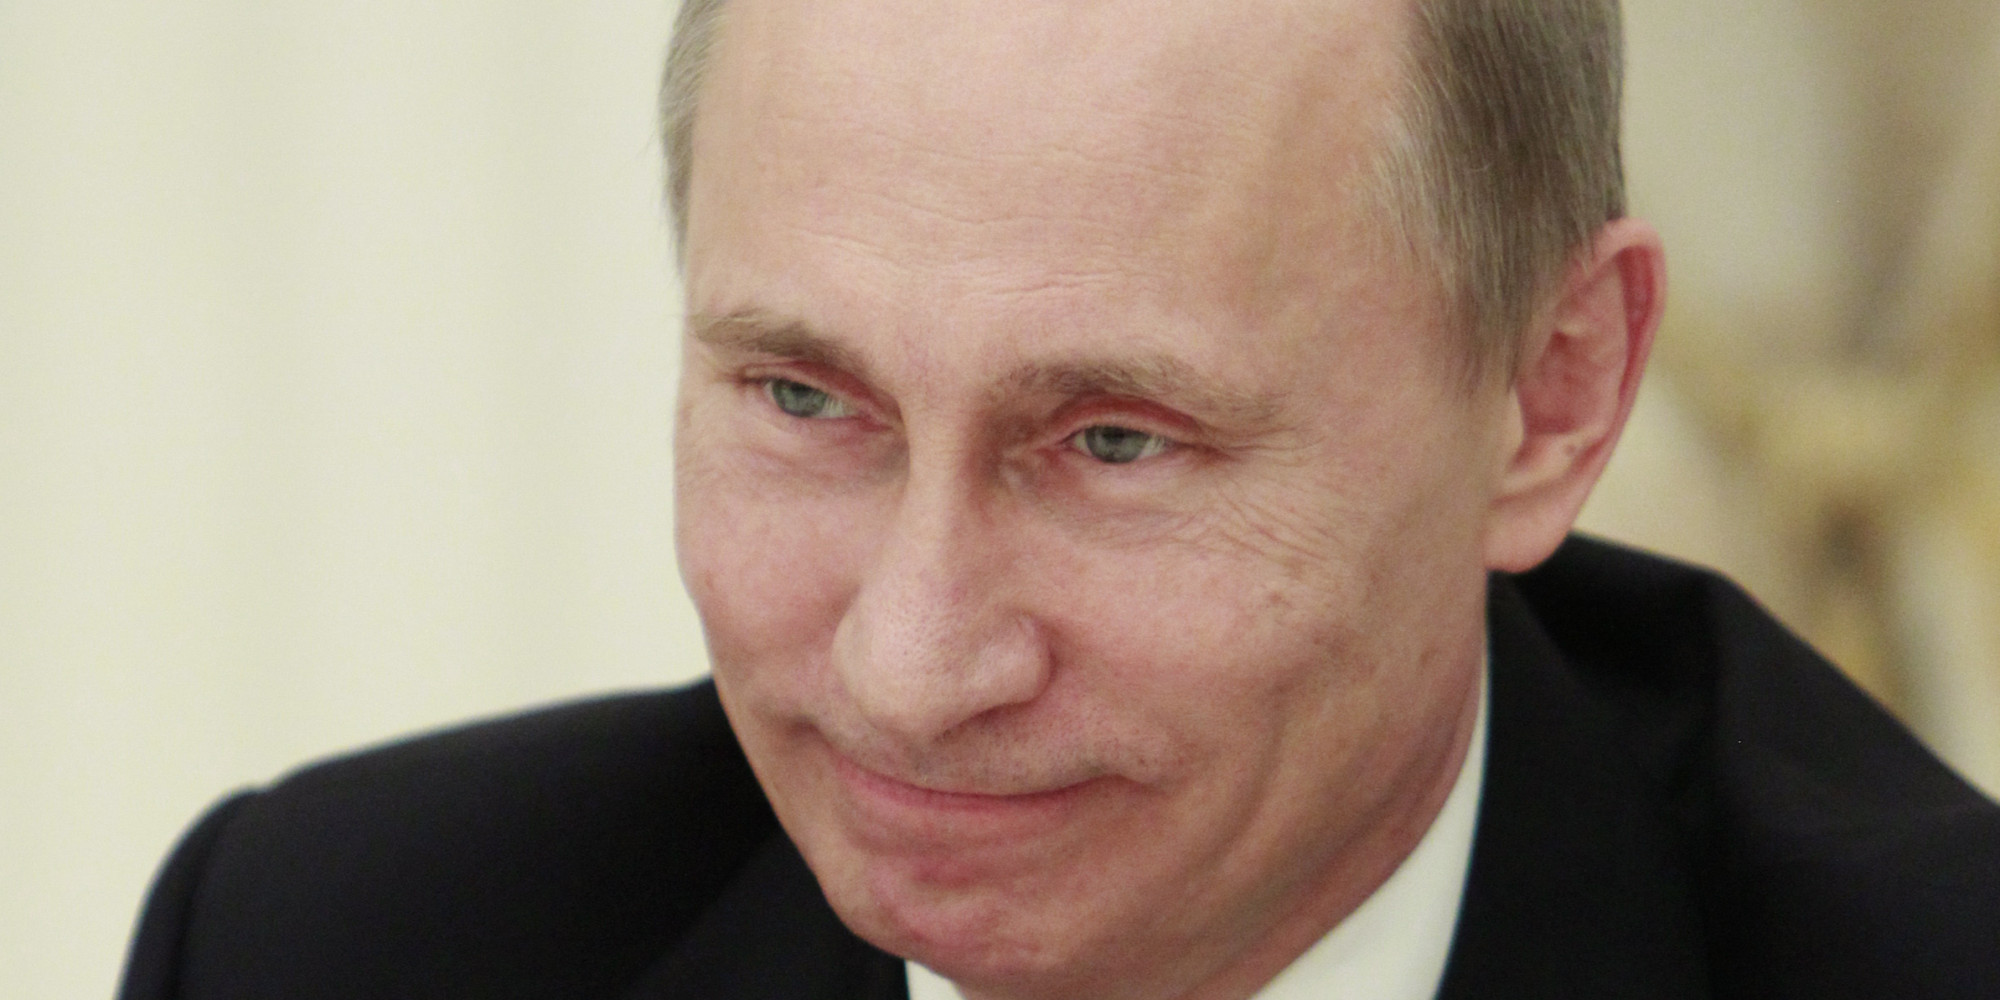 Putin Young Kgb | www.imgkid.com - The Image Kid Has It! Young Vladimir Putin Kgb